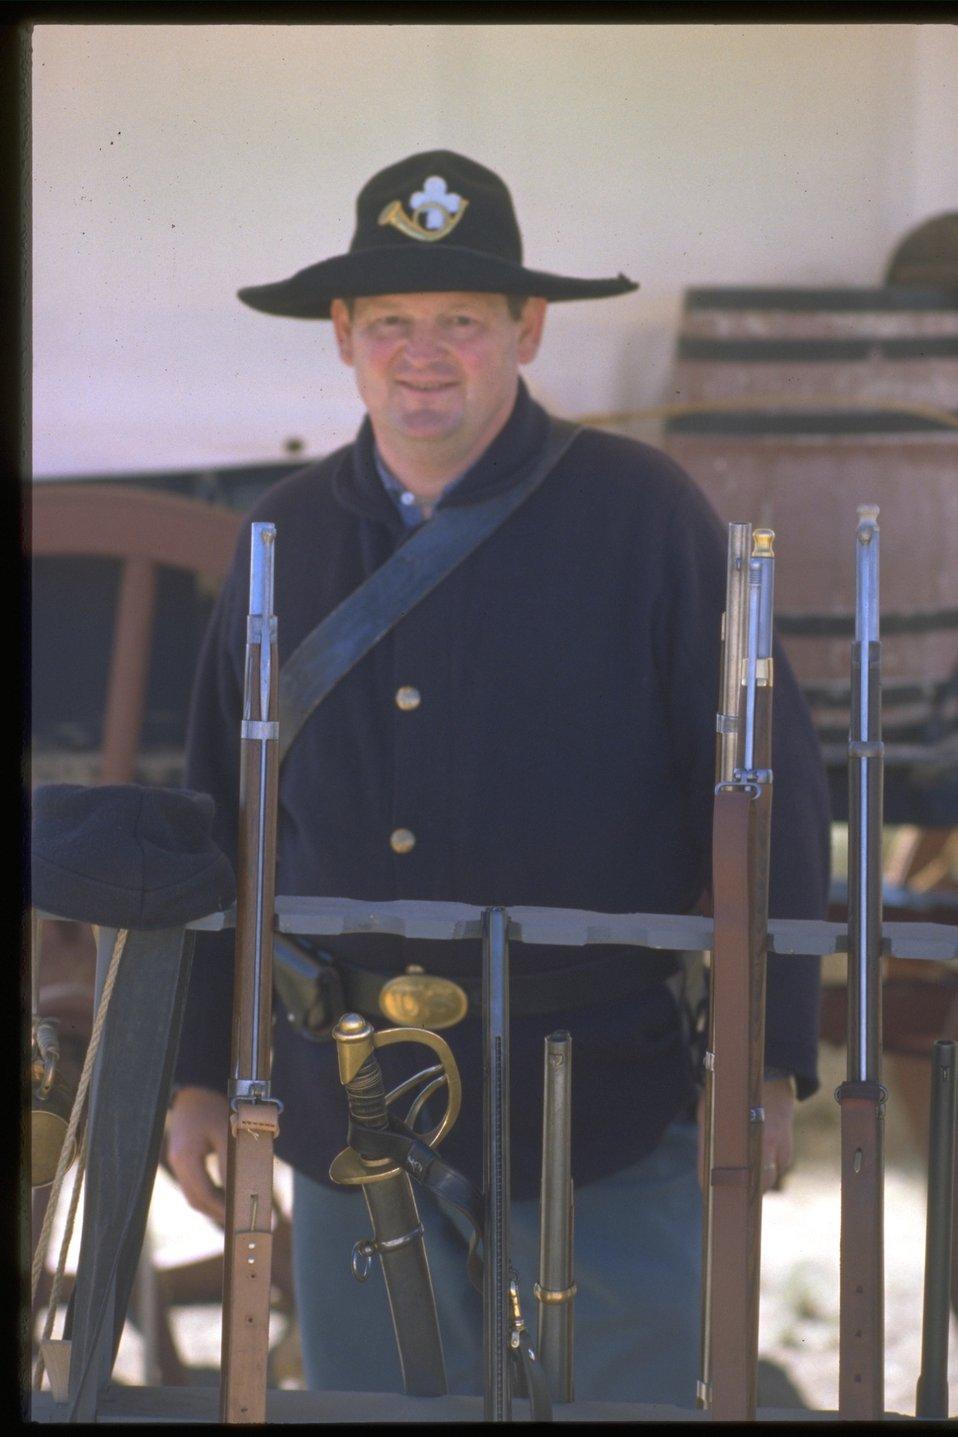 Pioneer festival scene--a soldier.